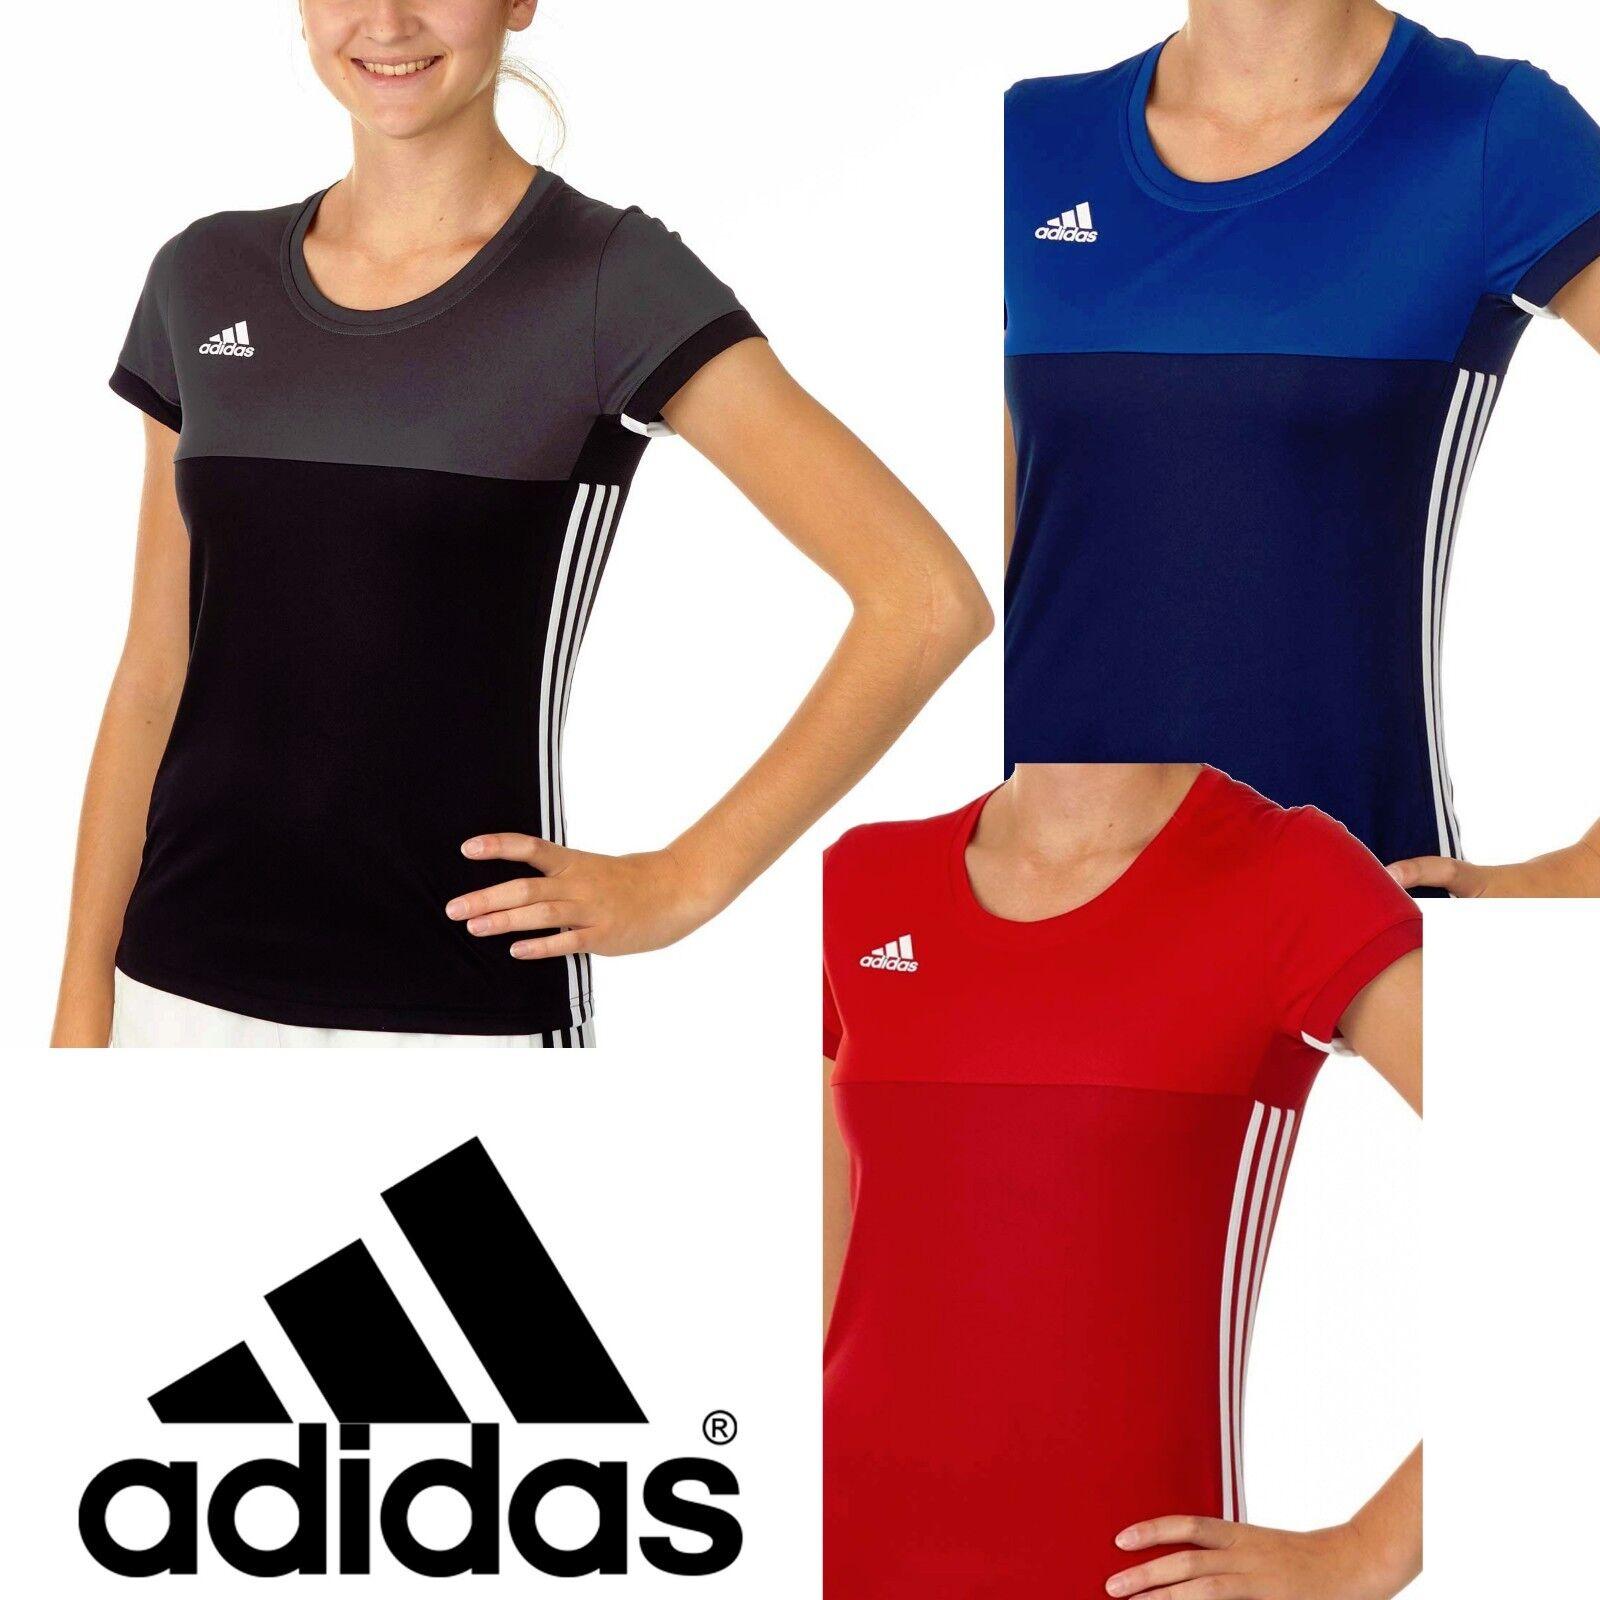 adidas Ladies T16 Climacool Αθλητικά Tee ΓυναικΡία ΓυμναστΞ�ρια Running T-Shirt Track Top